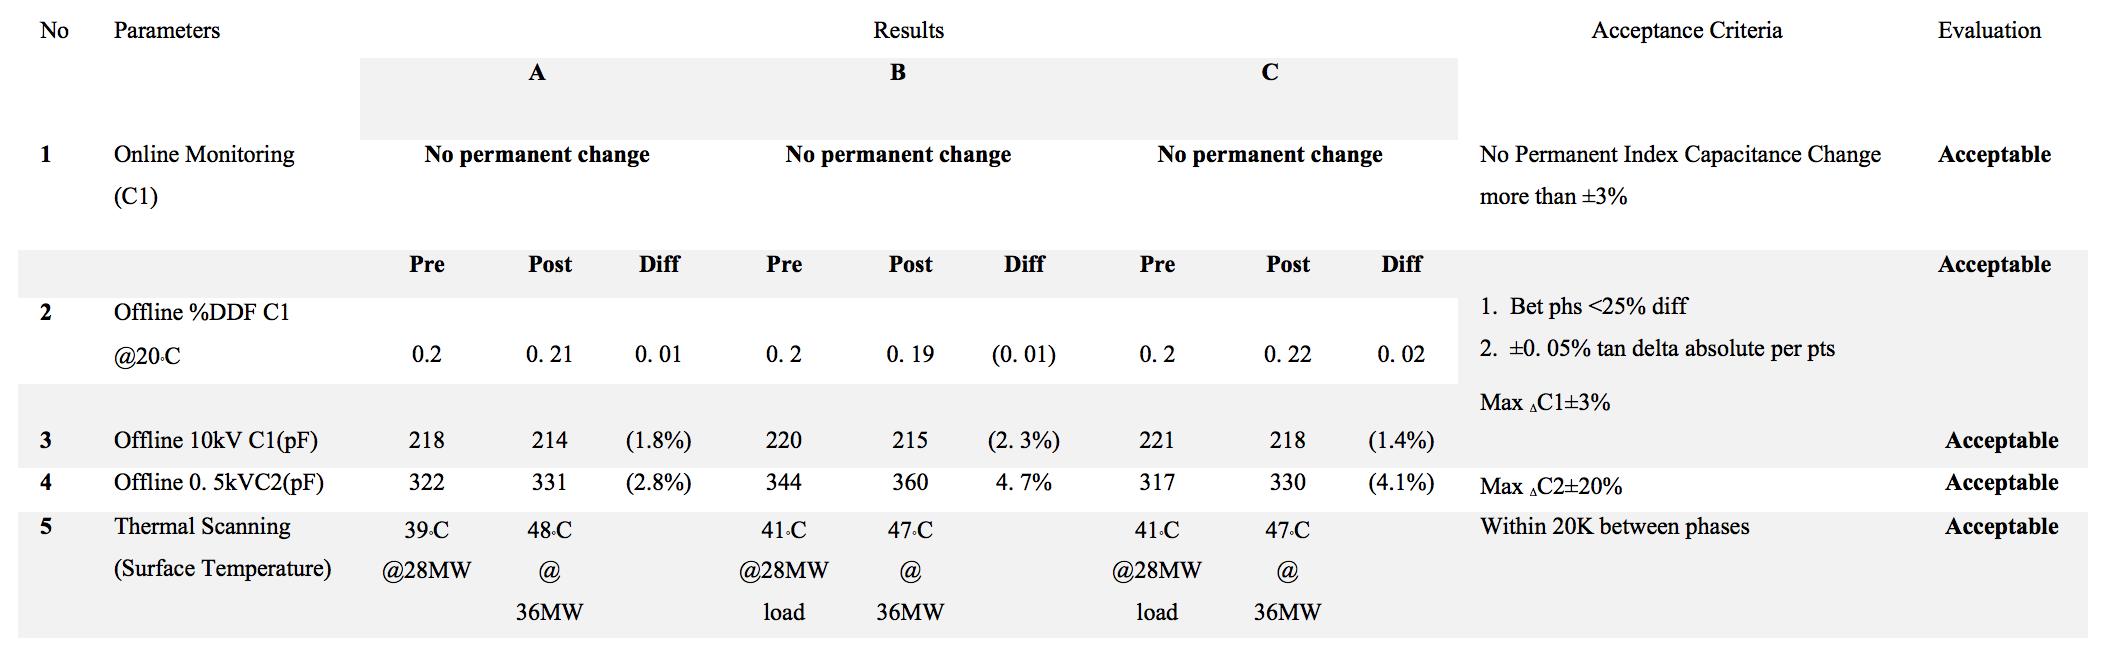 bushing Transformer Bushing Reliability Survey & Risk Mitigation Measures (Part 2 of 2) Results of Measurements of Online Bushing Monitoring